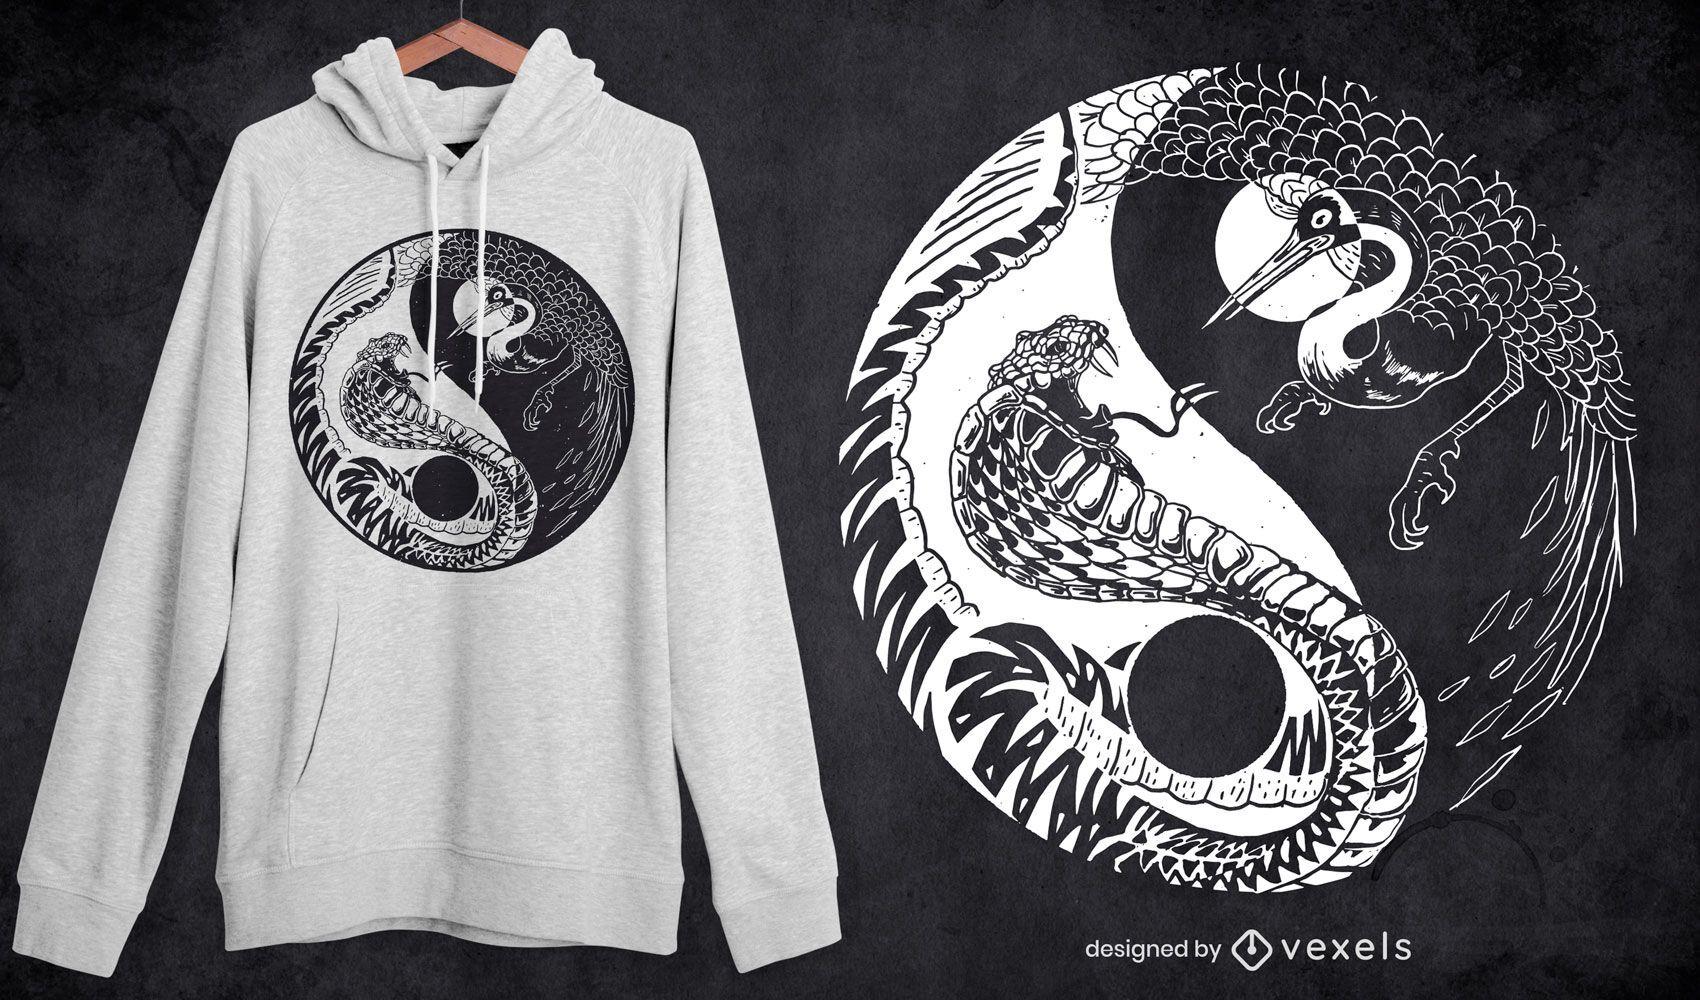 Yin yang hand-drawn animals t-shirt design